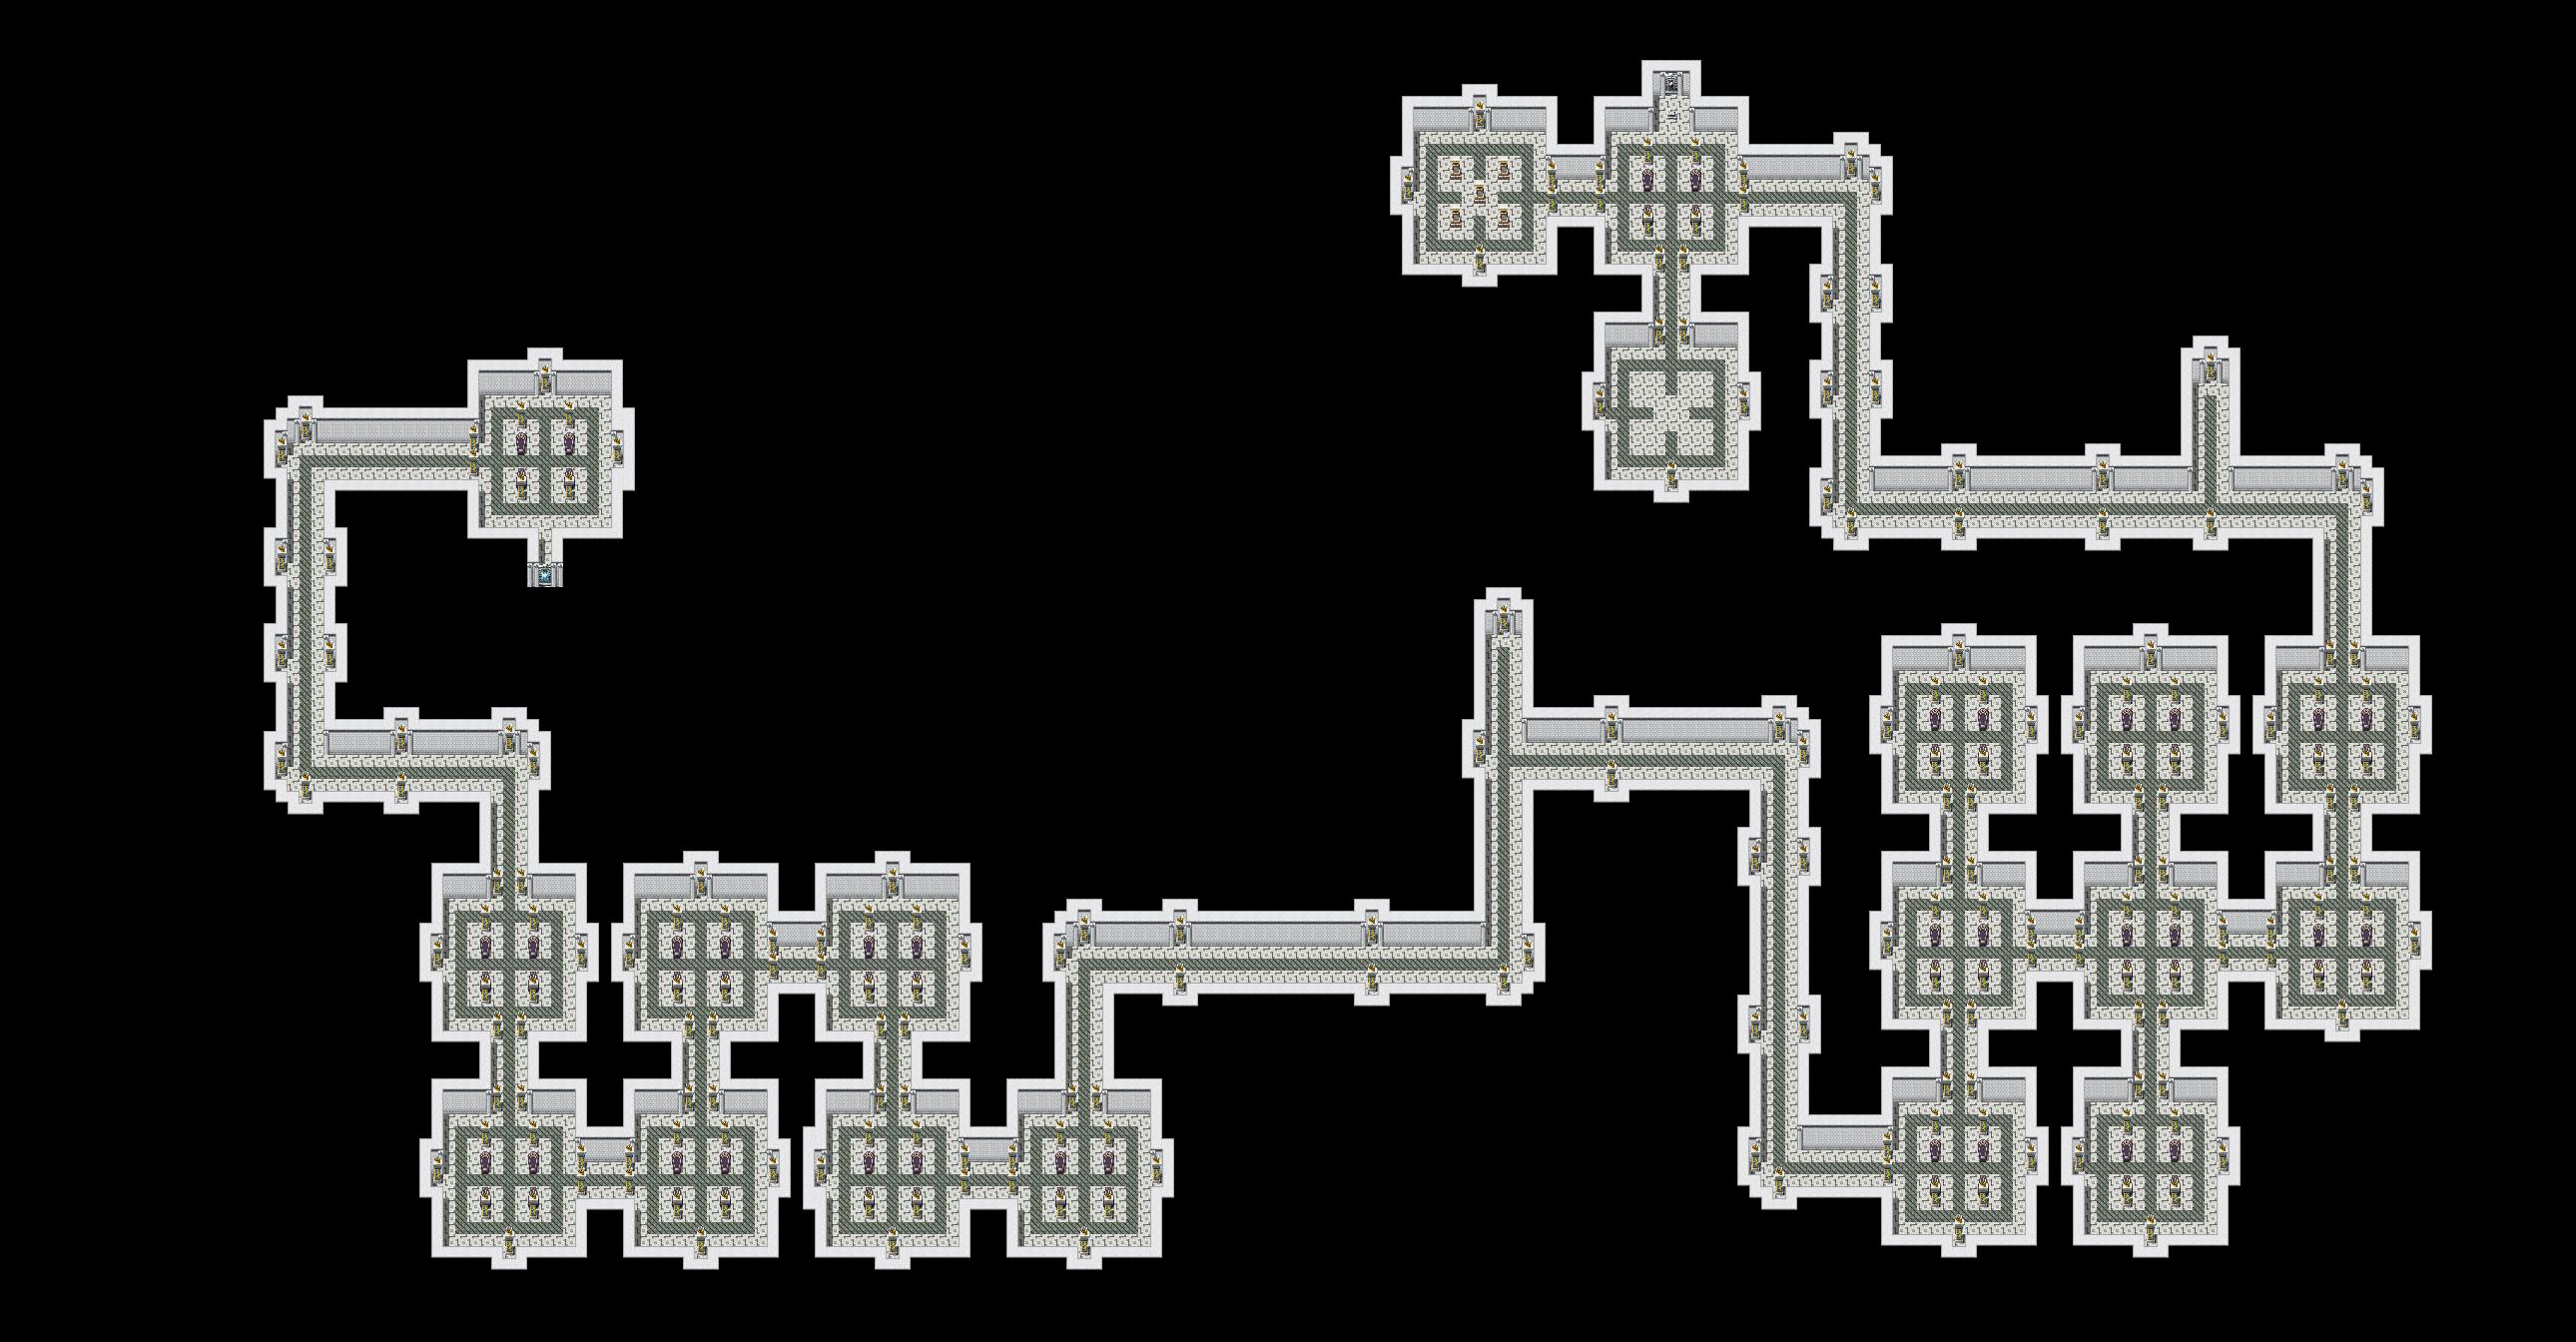 Catacombs B2